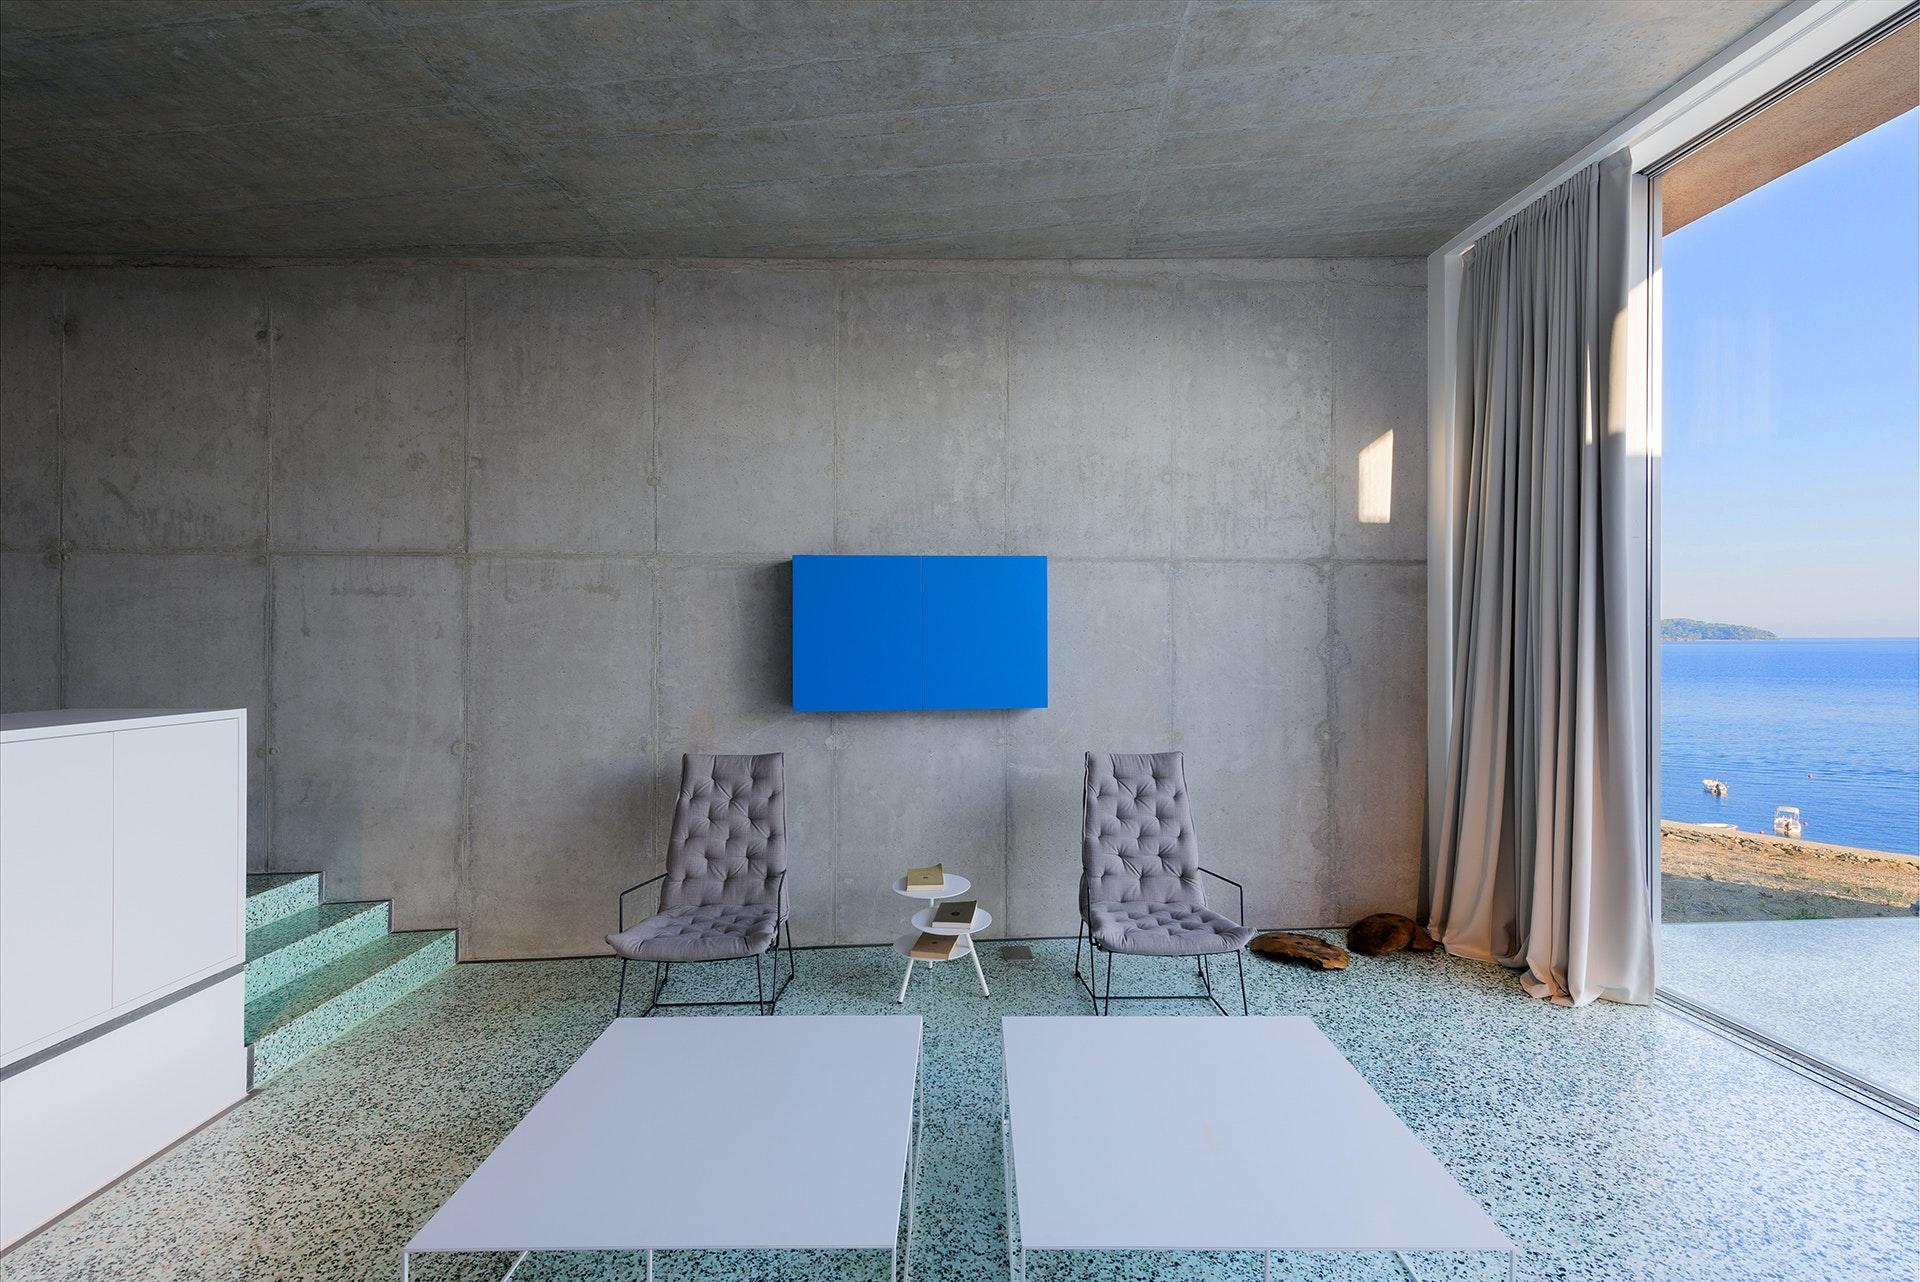 Inside Outside 10 Virtually Seamless Terrazzo Surfaces Architizer